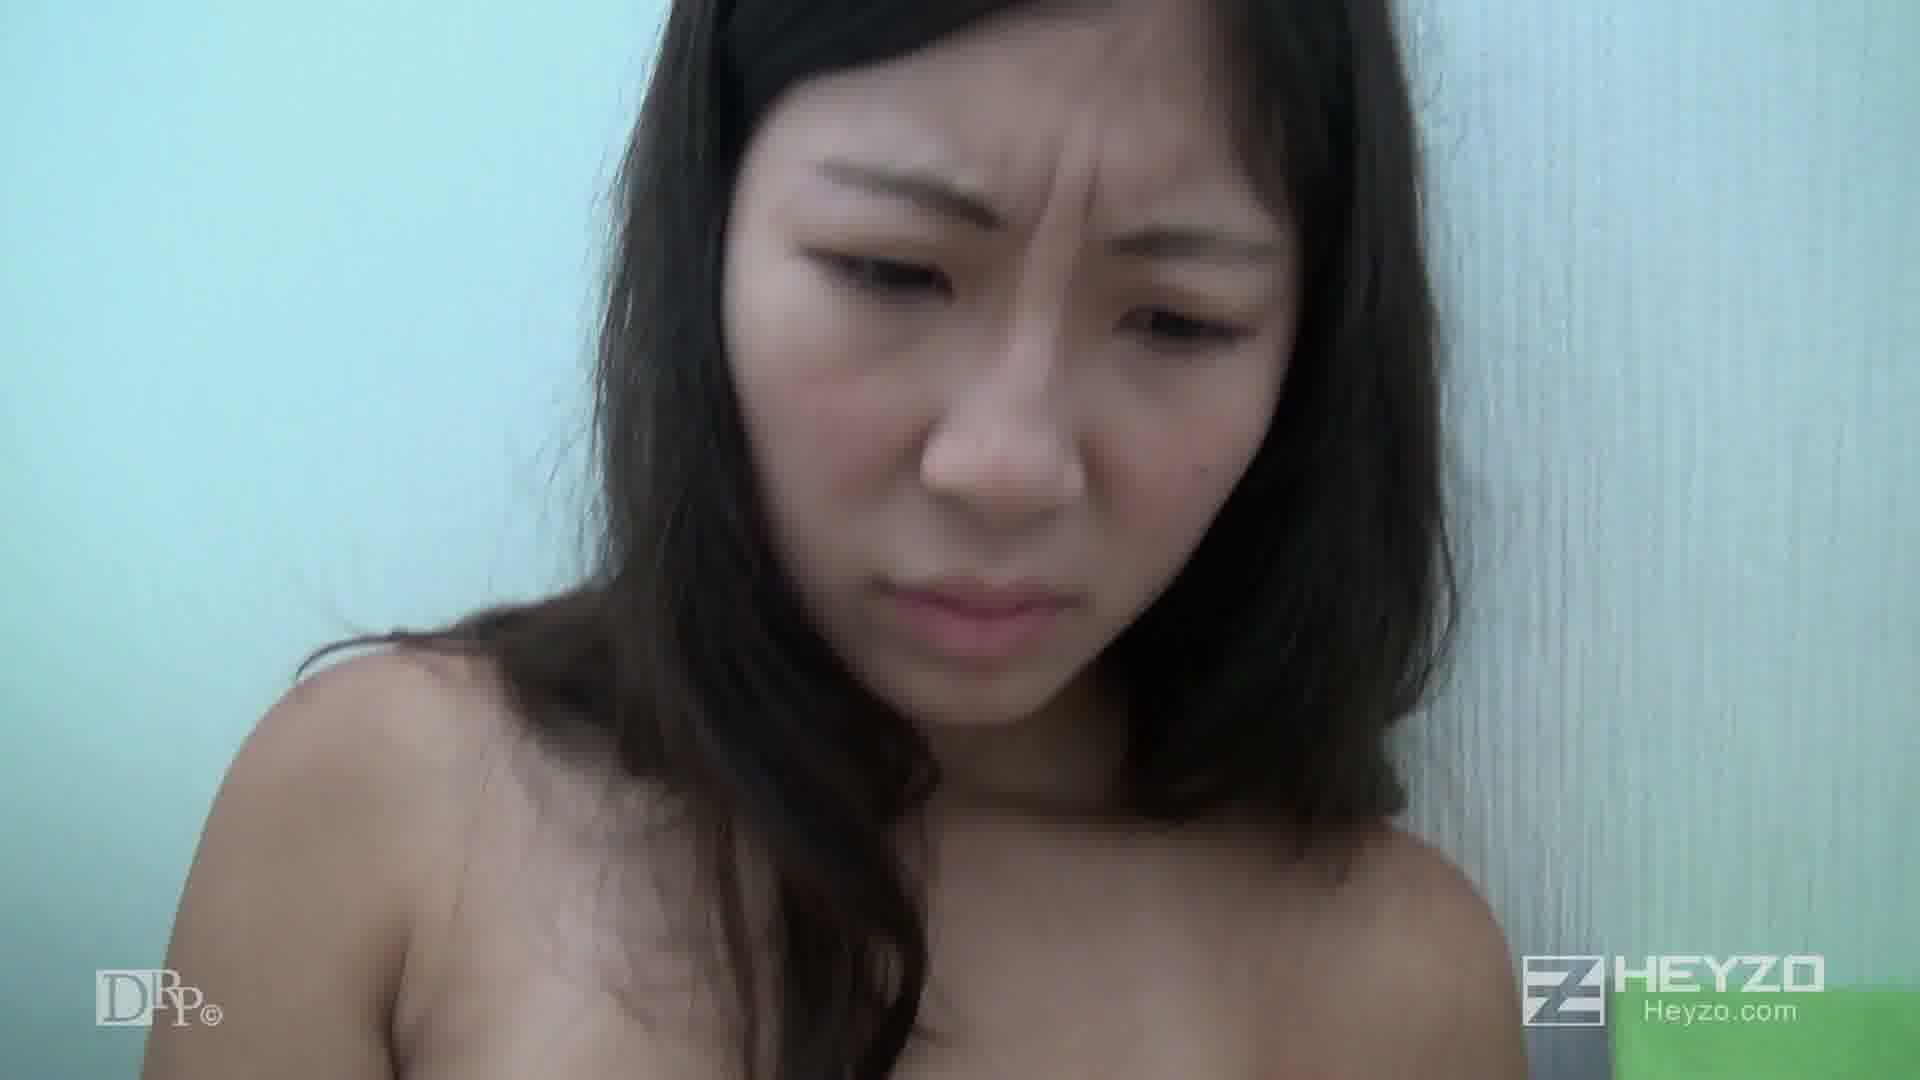 AV出演を迷っている素人娘をなし崩し的に撮影しちゃいました! - 篠田ゆき【フェラ 立ちバック オナニー 絡み まんぐり返し】